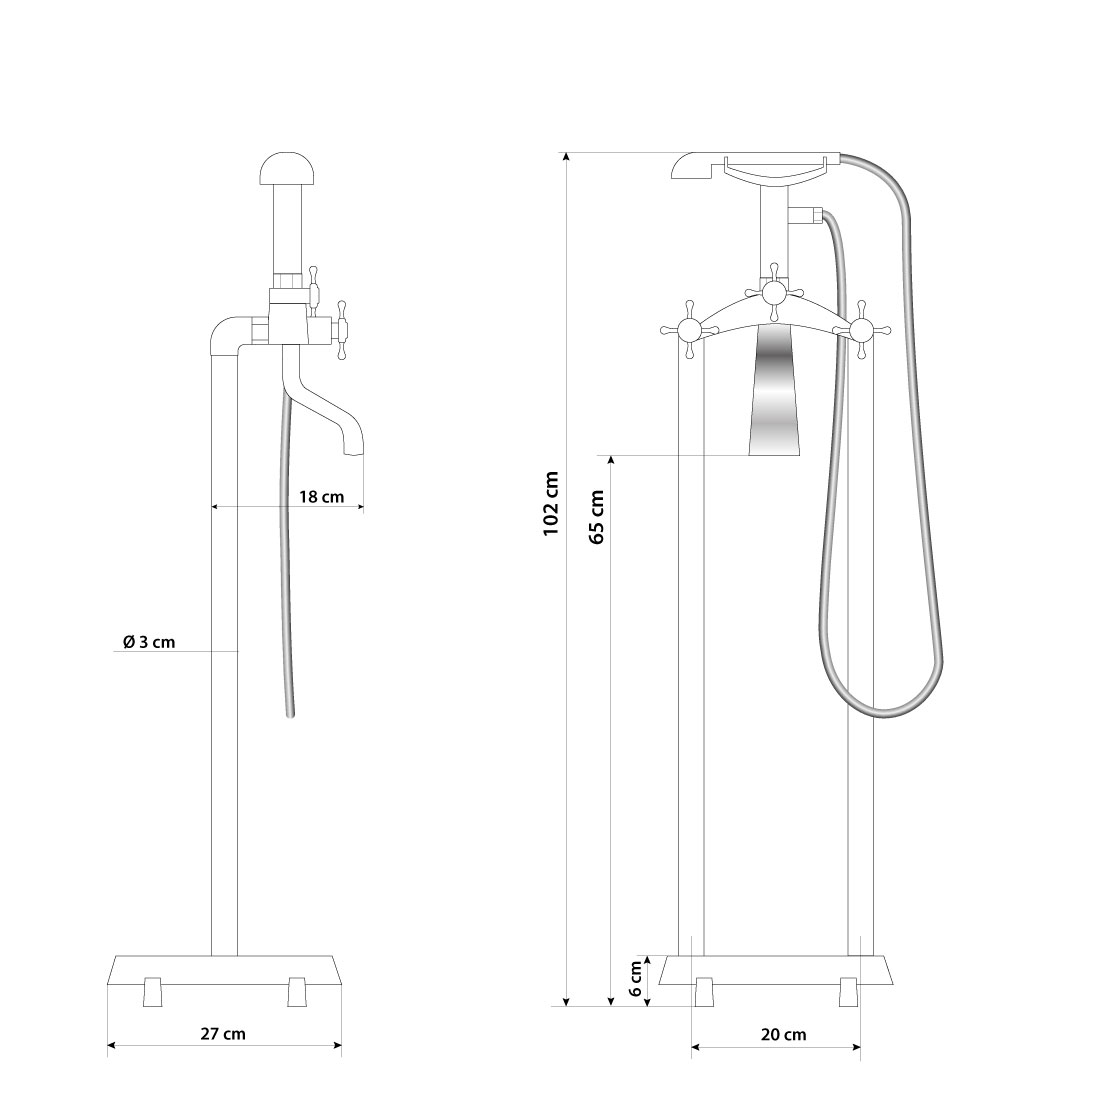 Armatur freistehende wanne badewanne wannenmischbatterie standarmatur afsw01 - Standarmatur freistehende badewanne ...